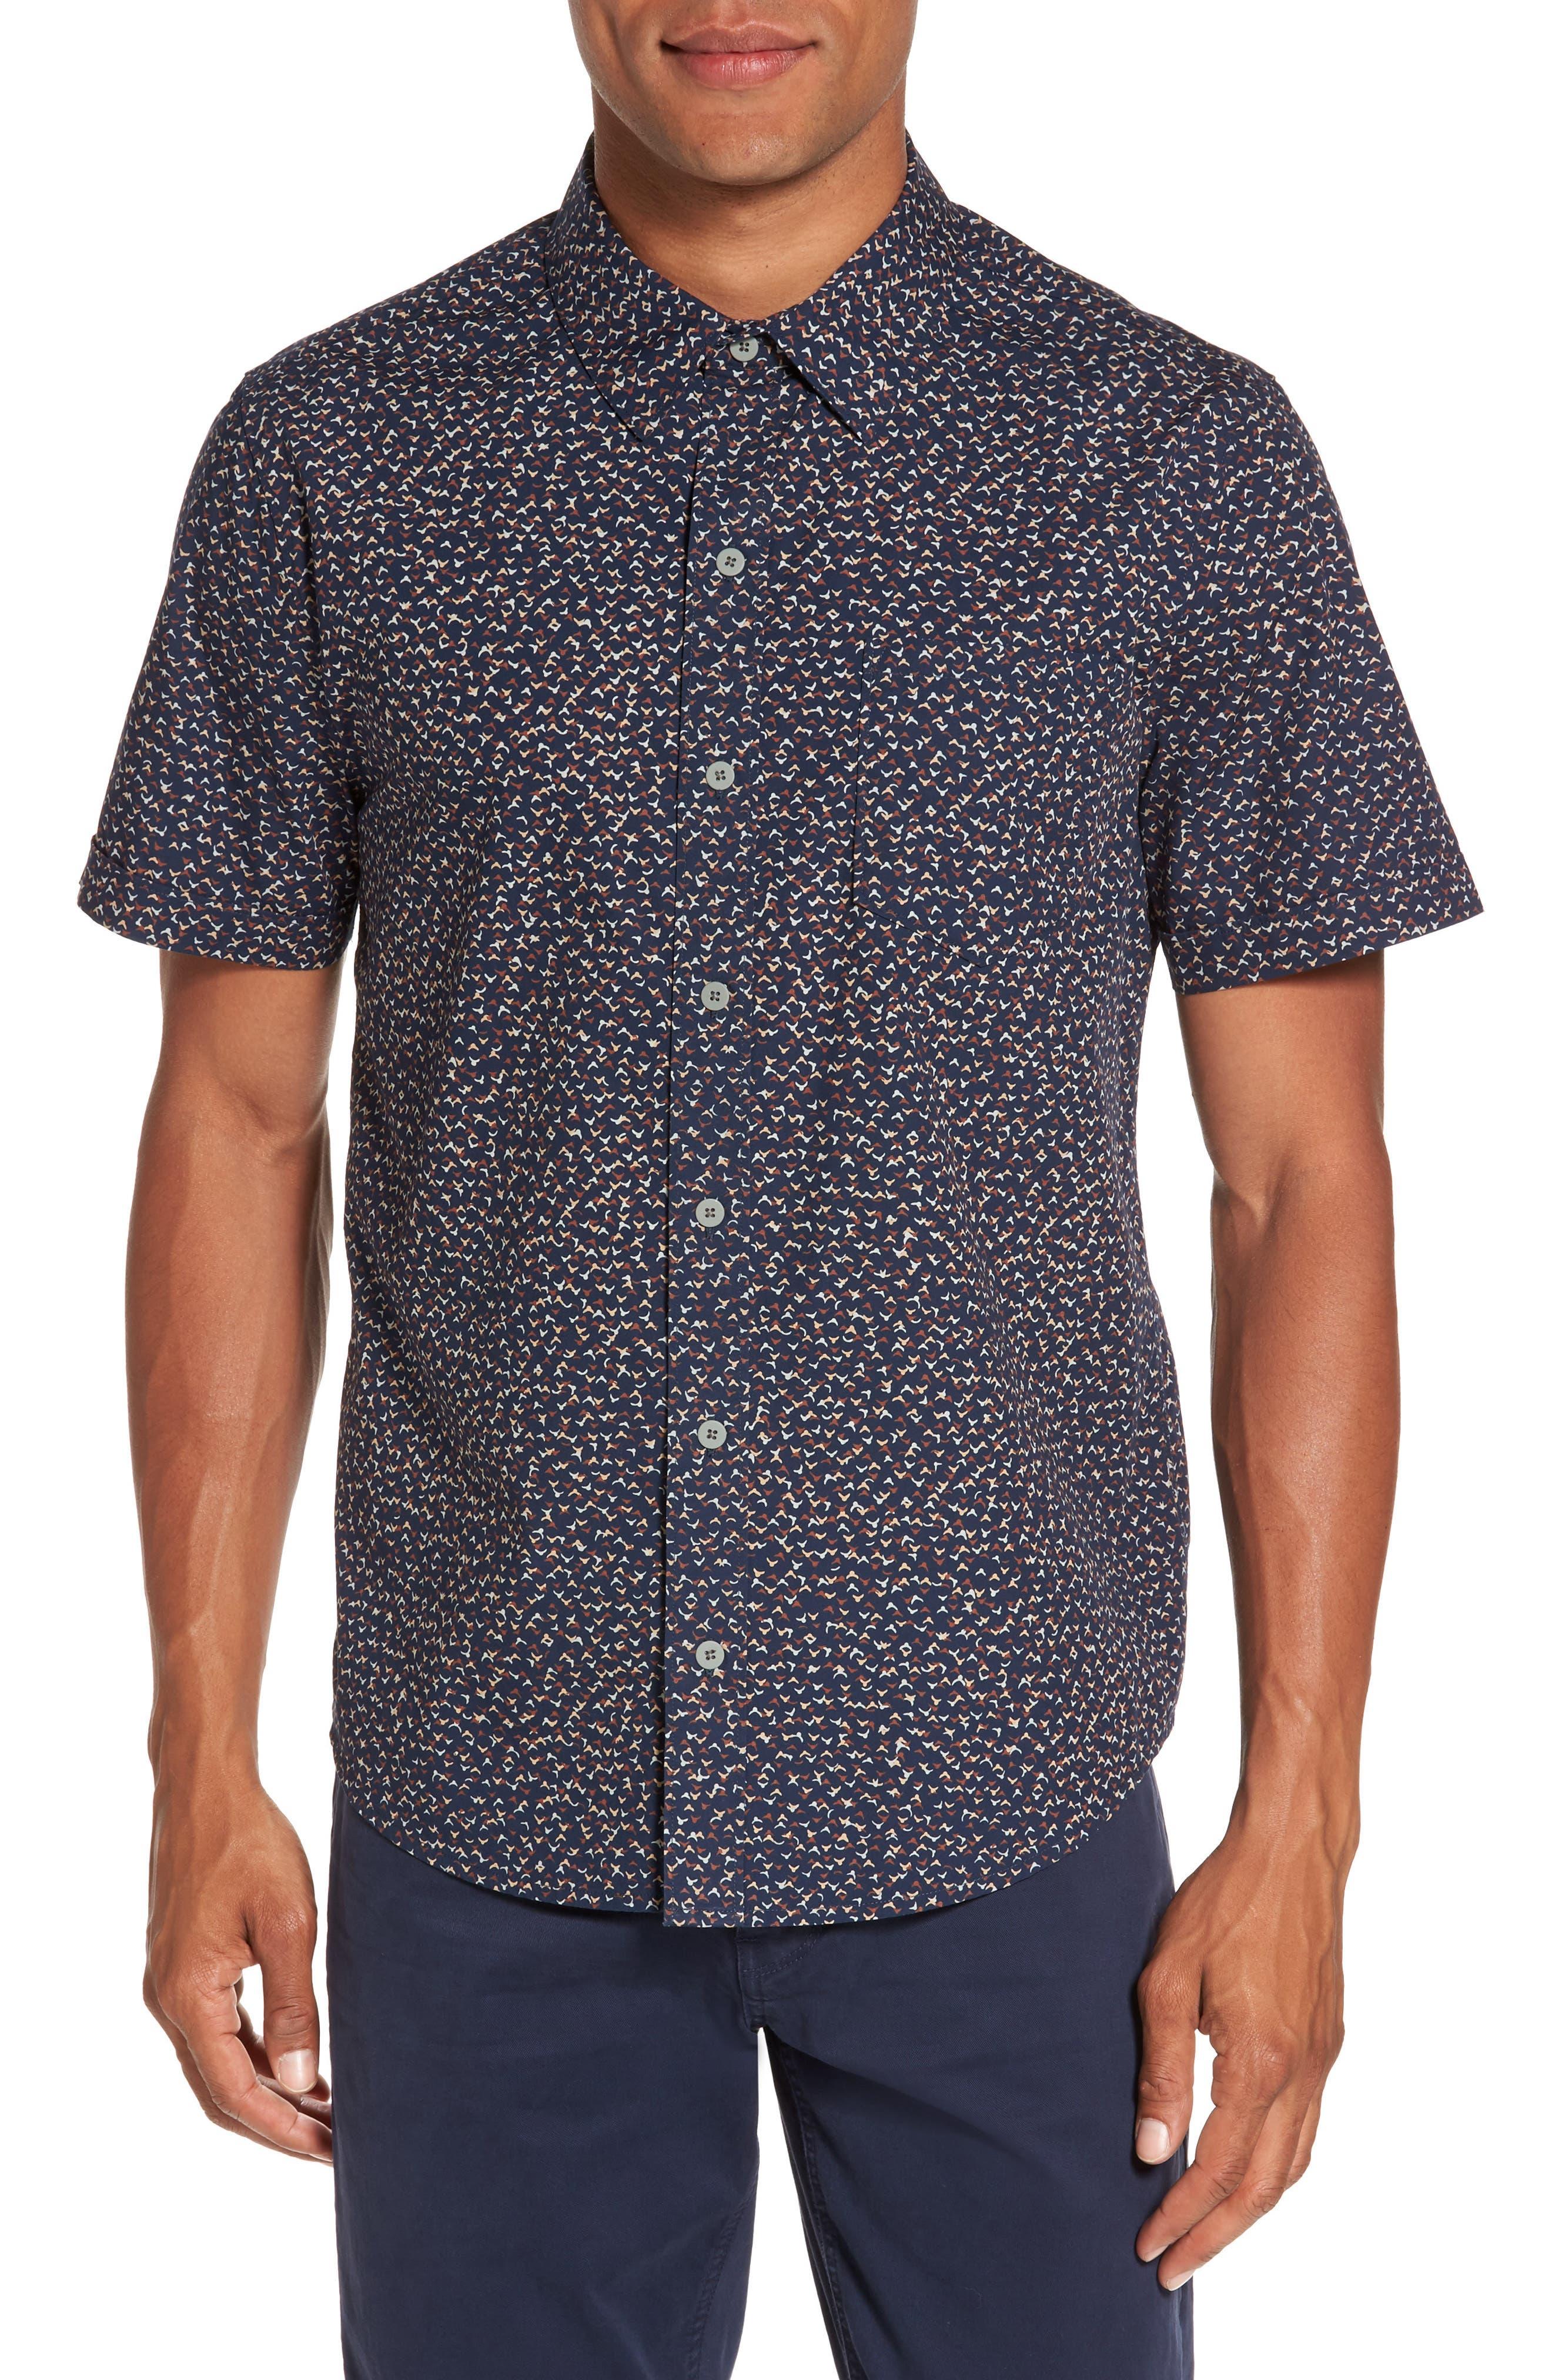 Becker Patterned Woven Shirt,                             Main thumbnail 1, color,                             400